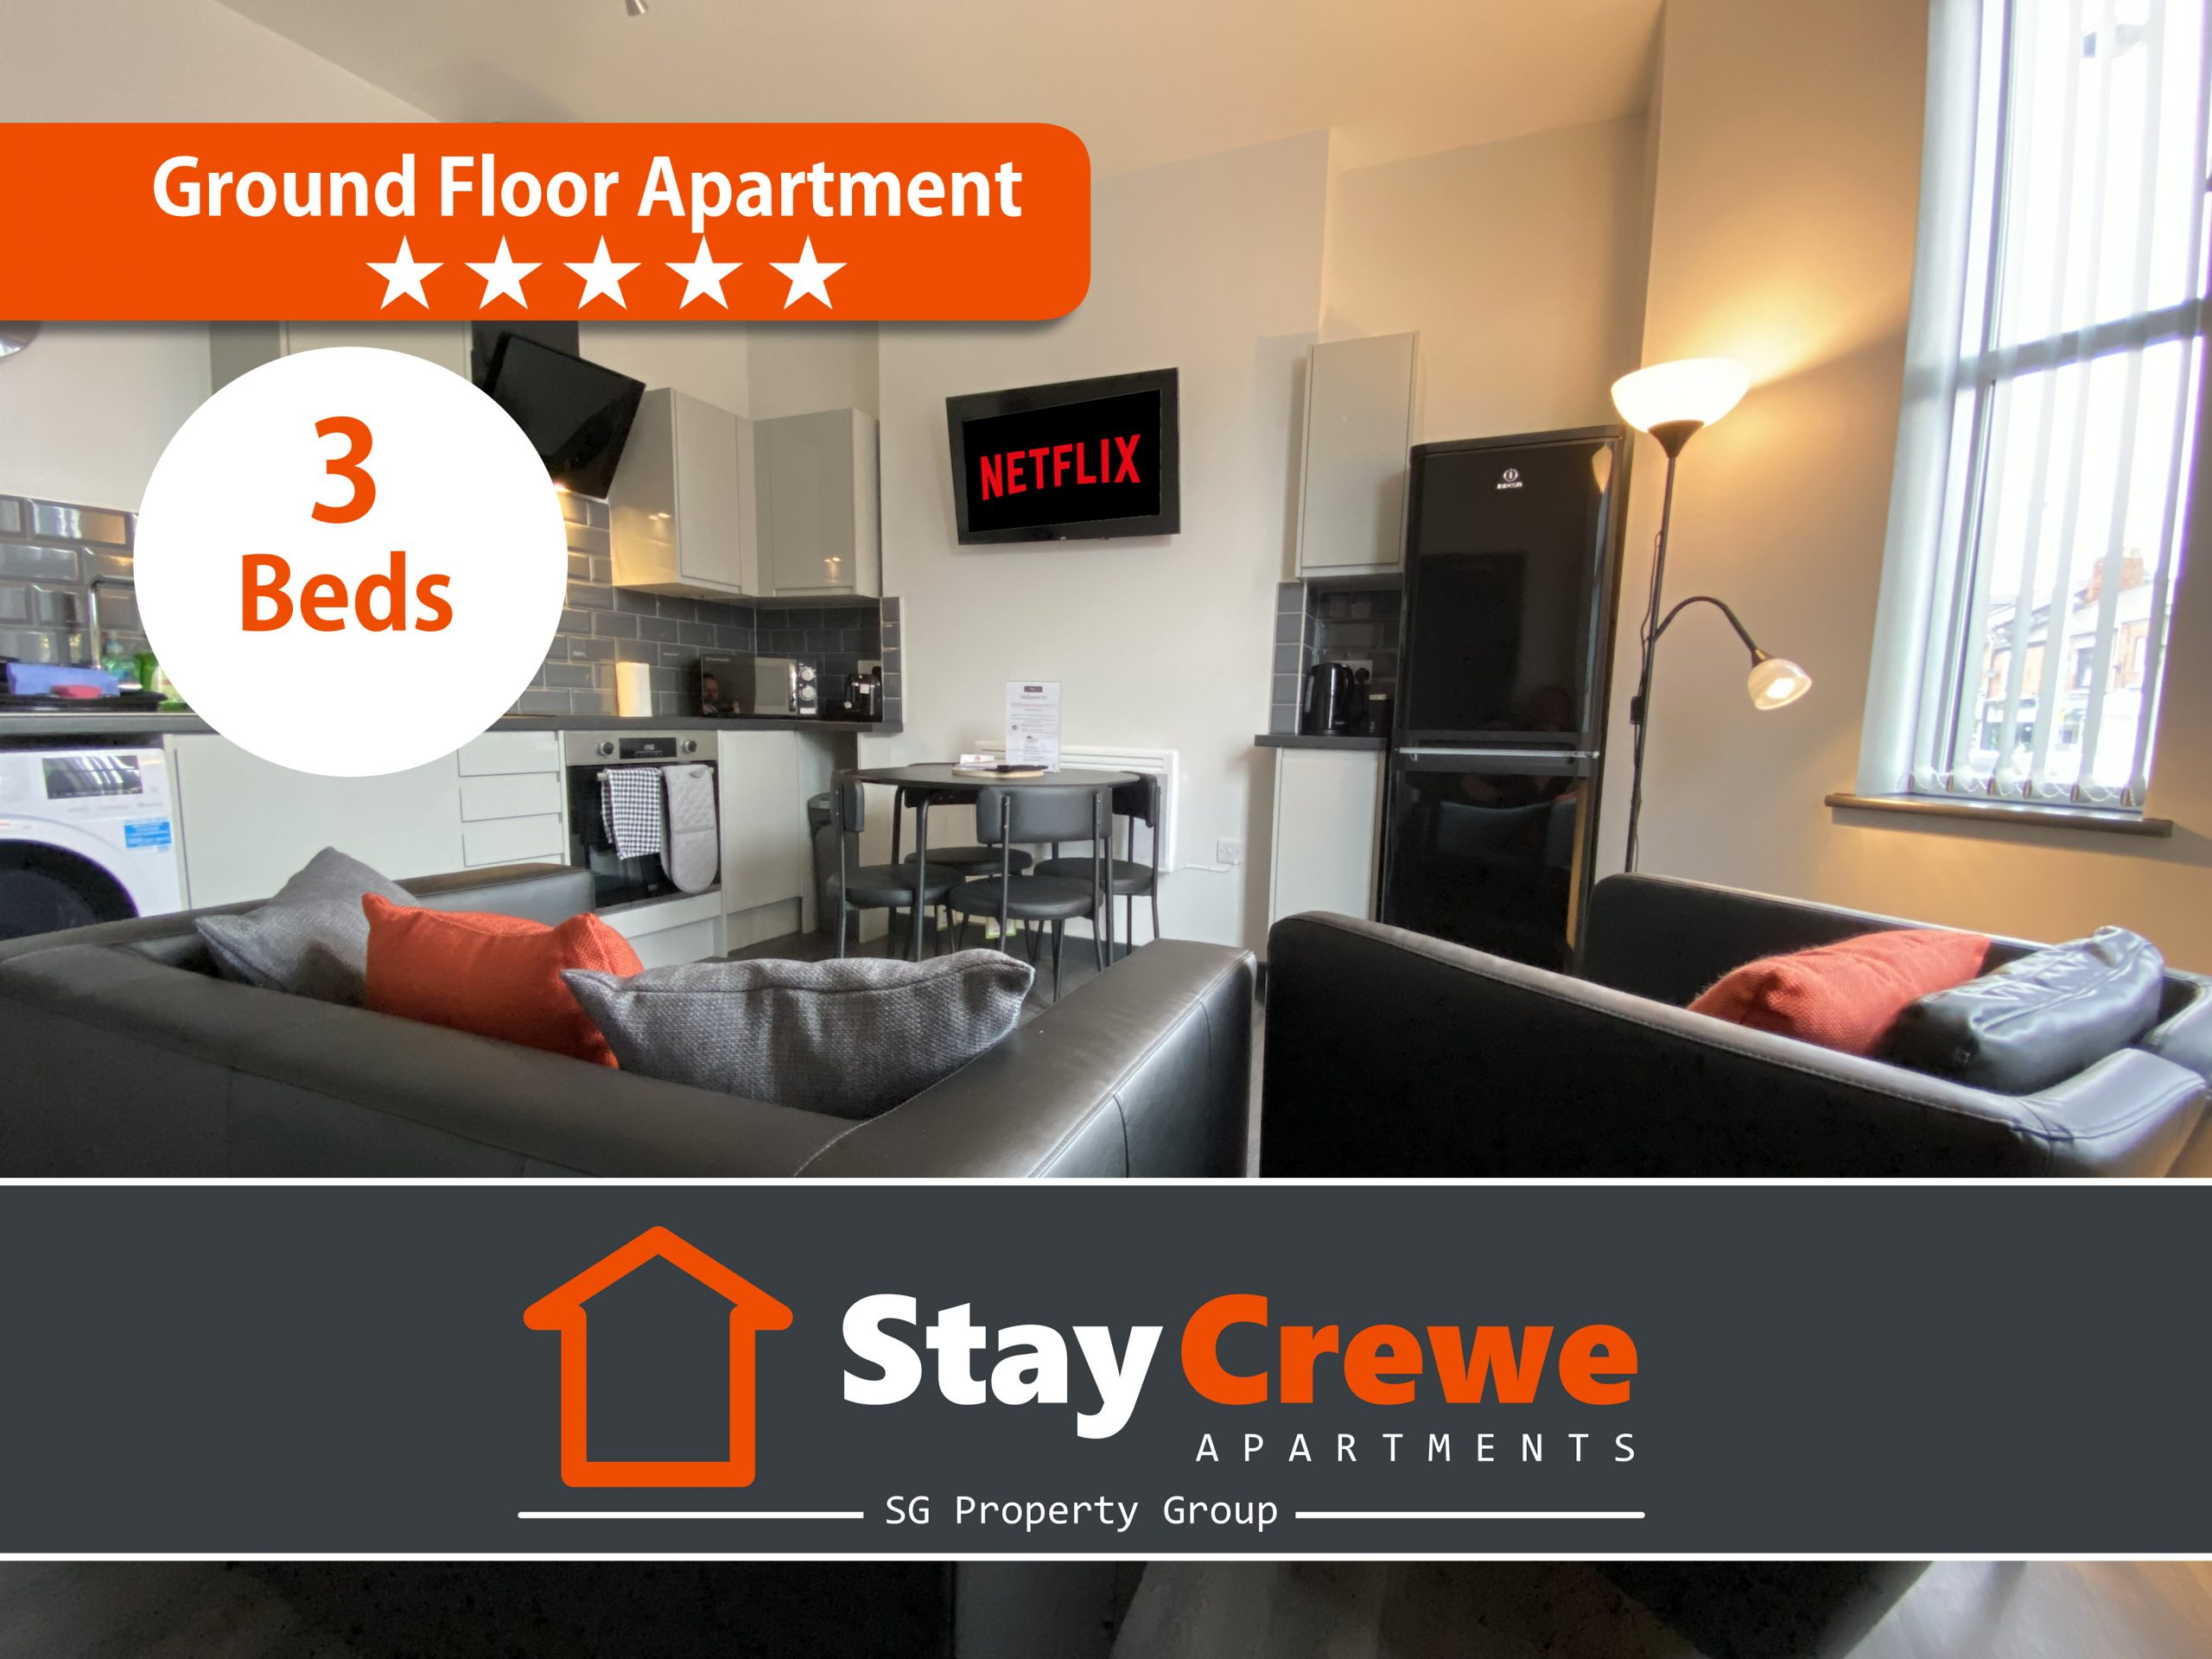 StayCrewe Apartments – Apt 1